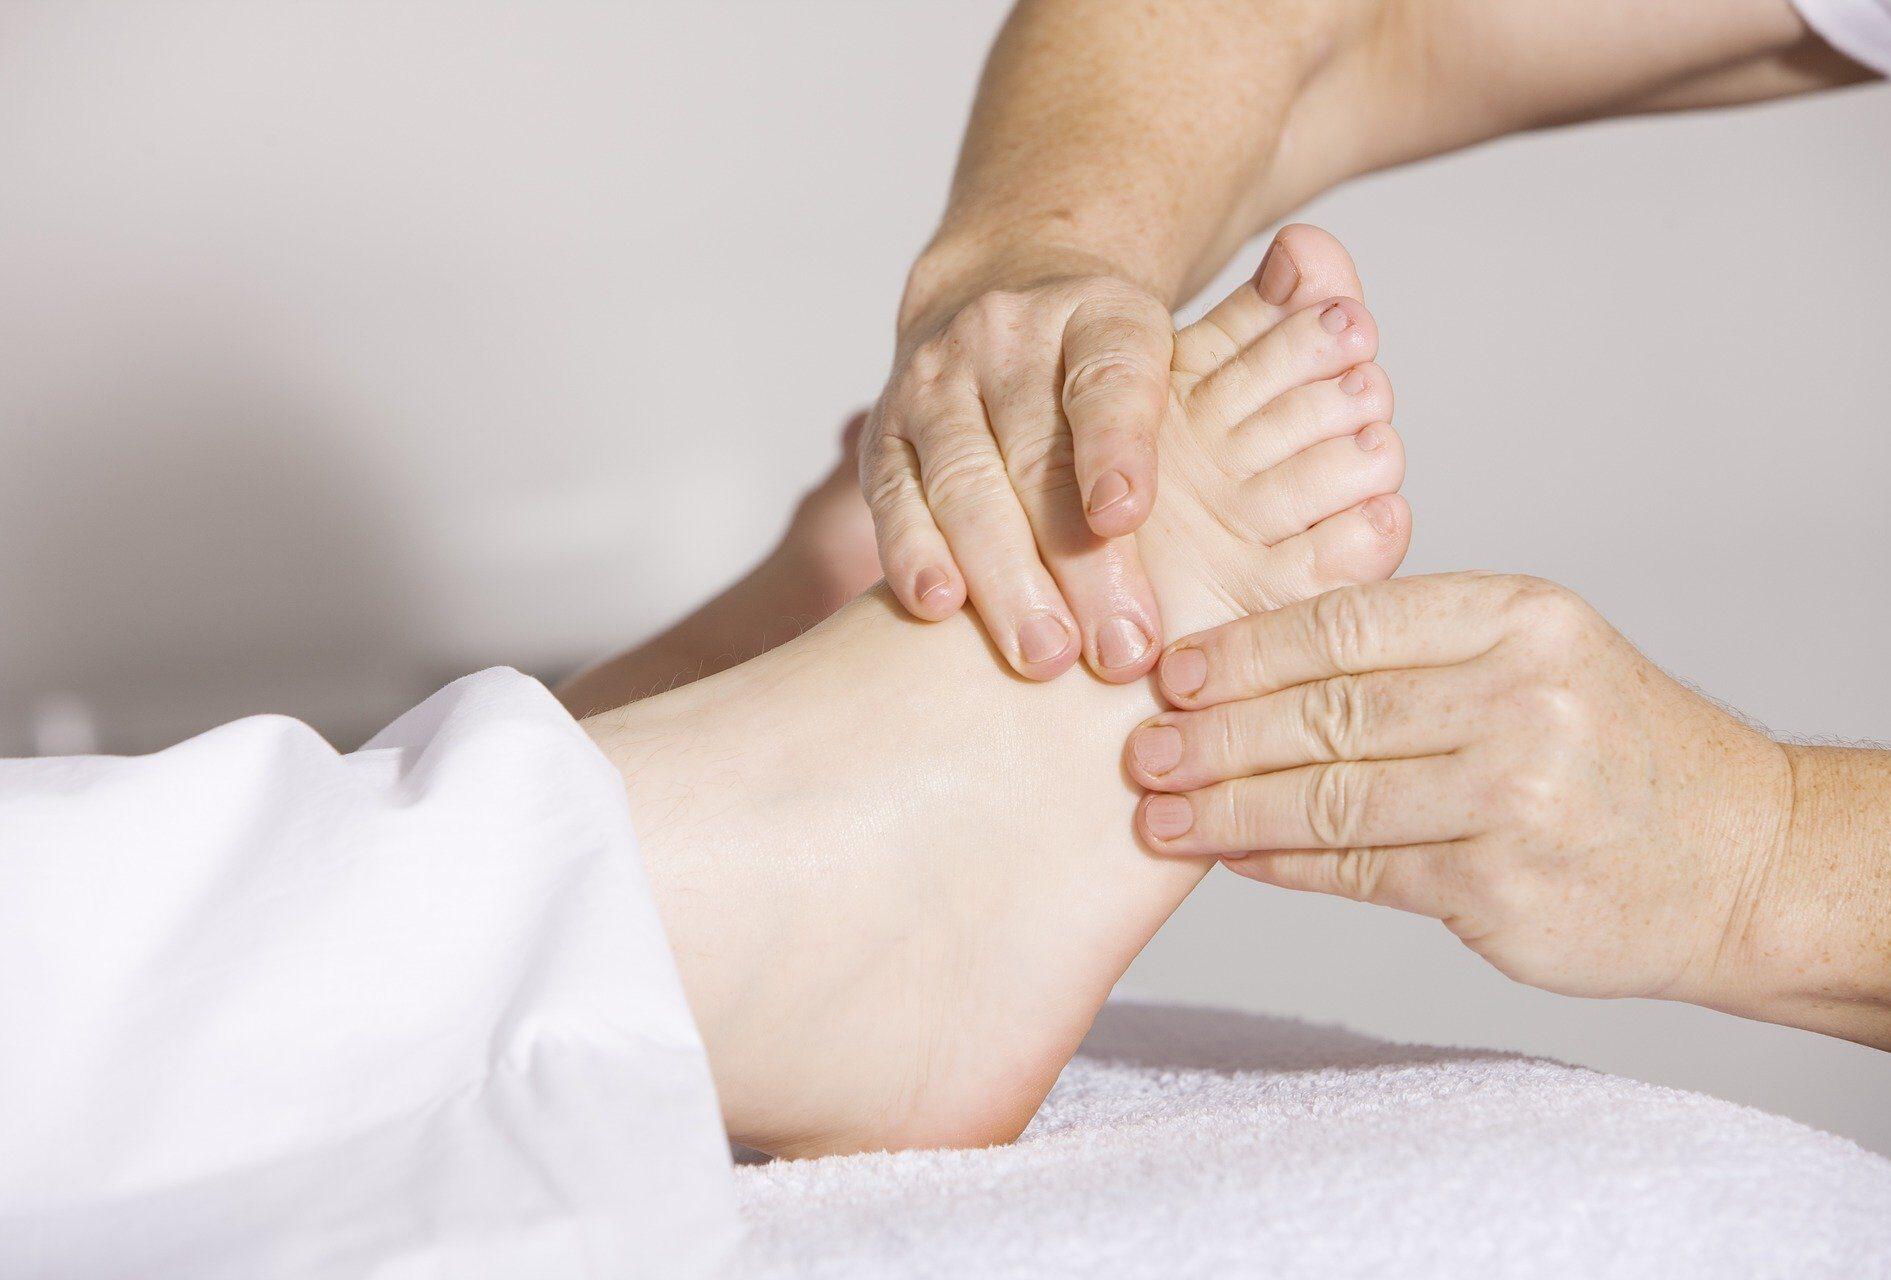 Physiotherapie Fuß Hände